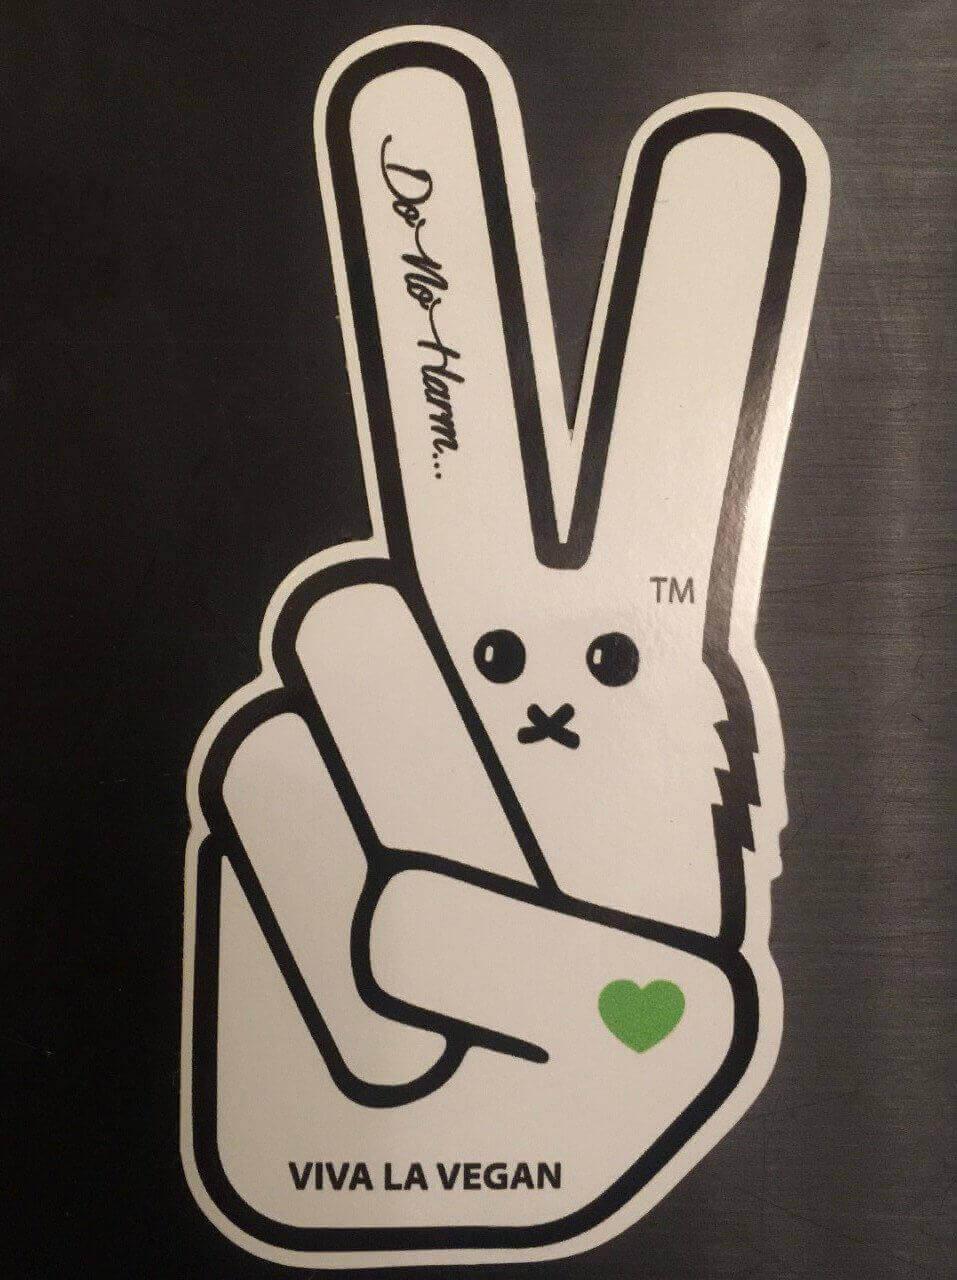 Vinyl Vegan Sticker - VLV Signature Finger Bunny